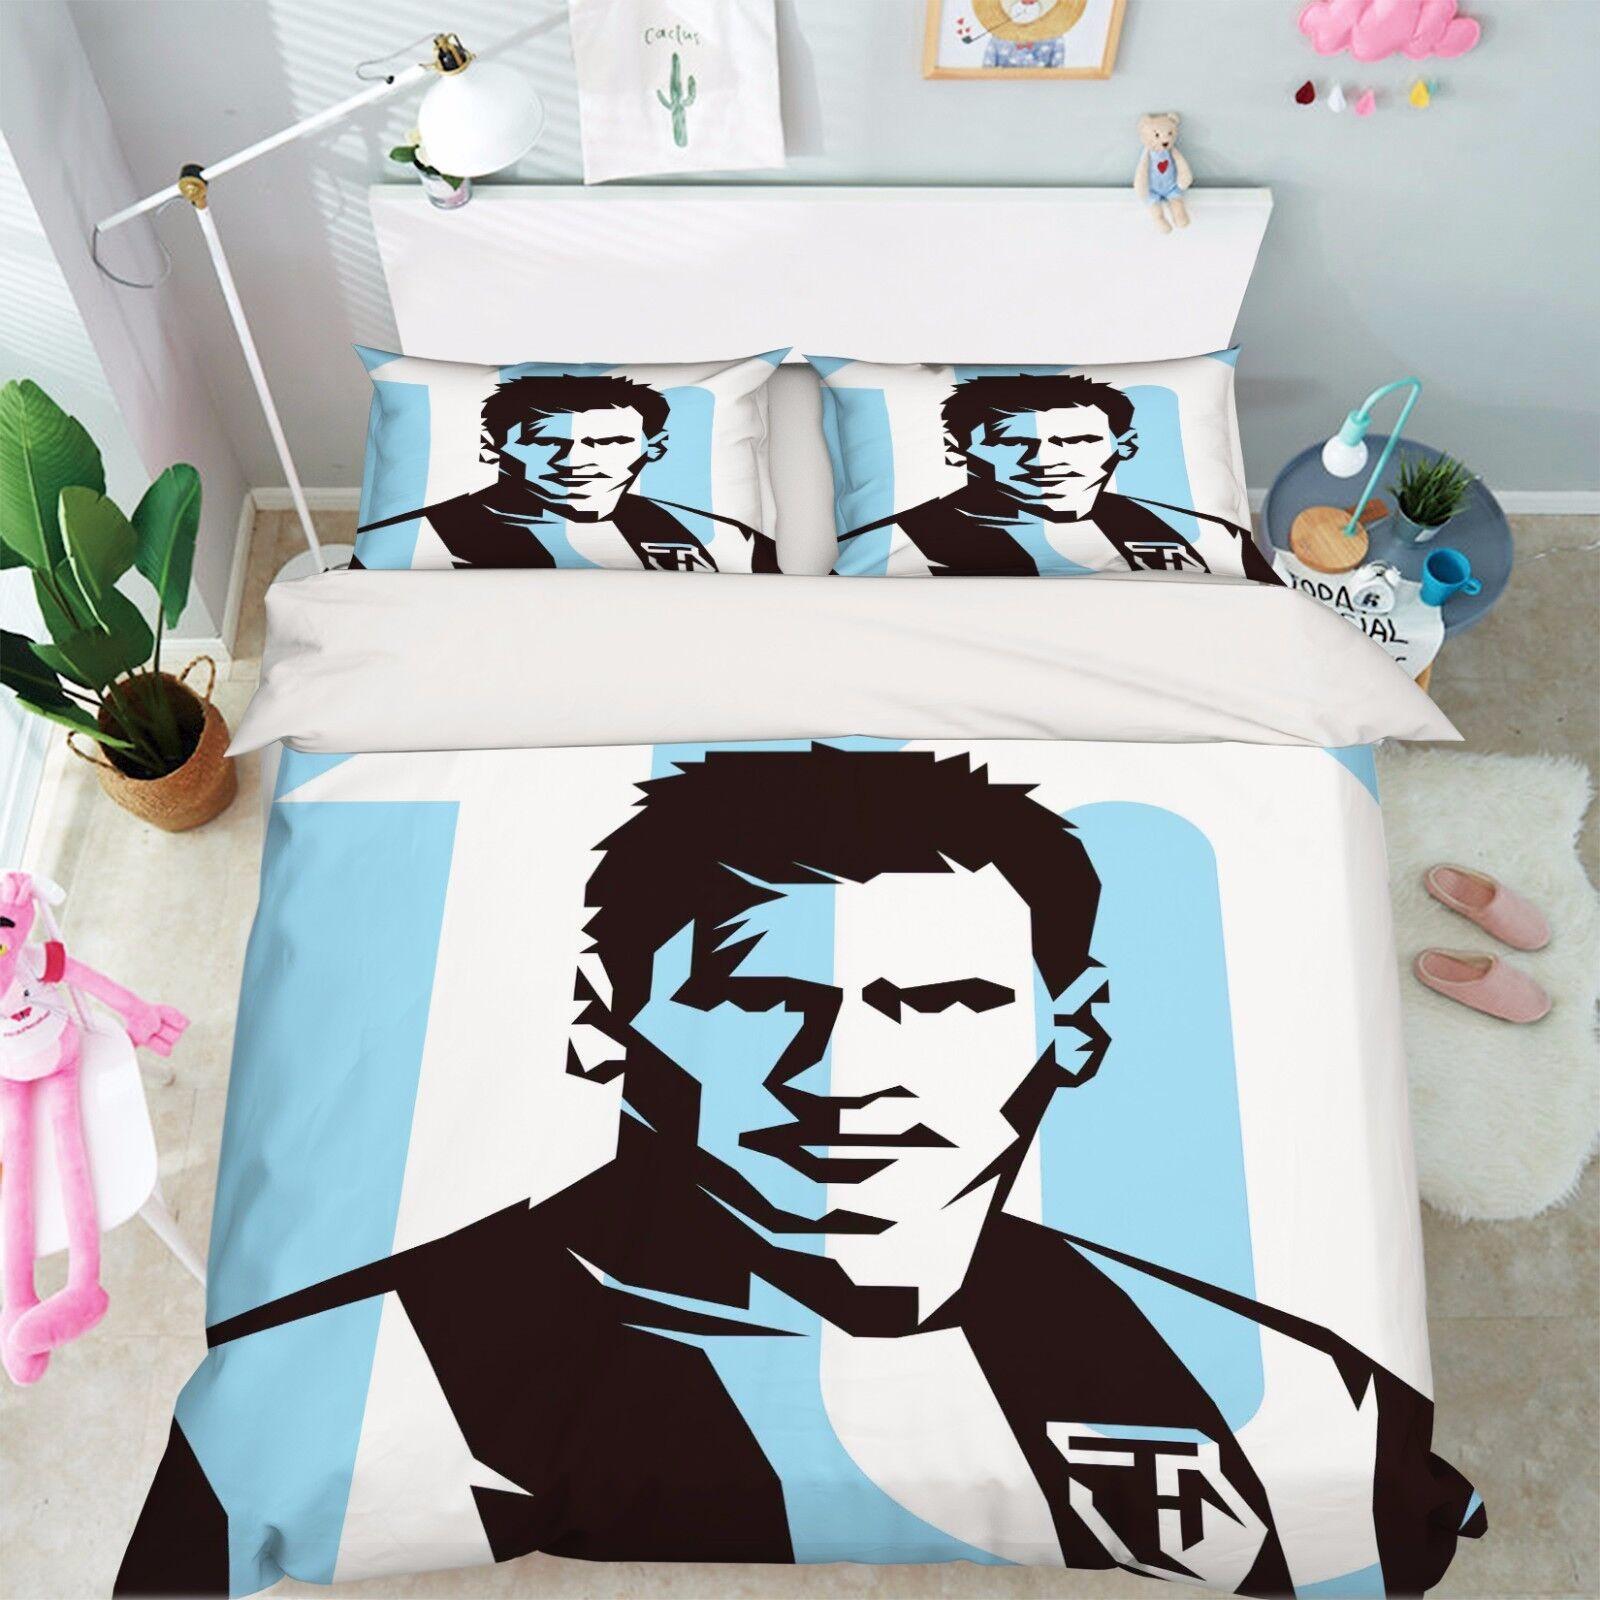 3D Handsome Man Bed Pillowcases Quilt Duvet Cover Set Single Queen King Größe AU